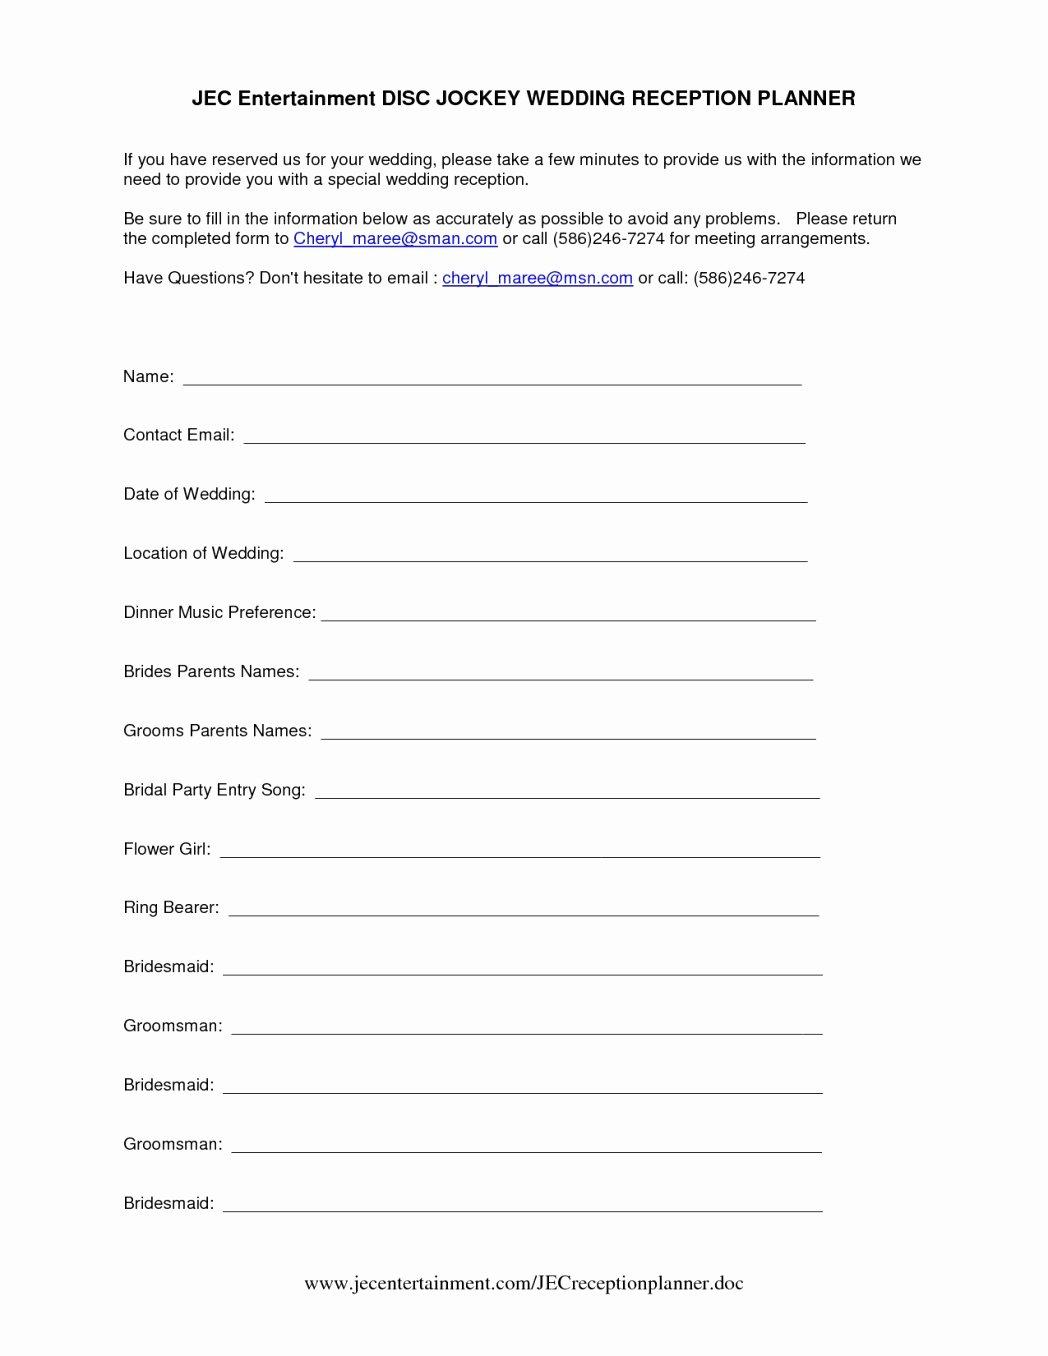 Disc Jockey Contracts Template Elegant Disc Jockey Contracts Template Elegant Wedding Planner